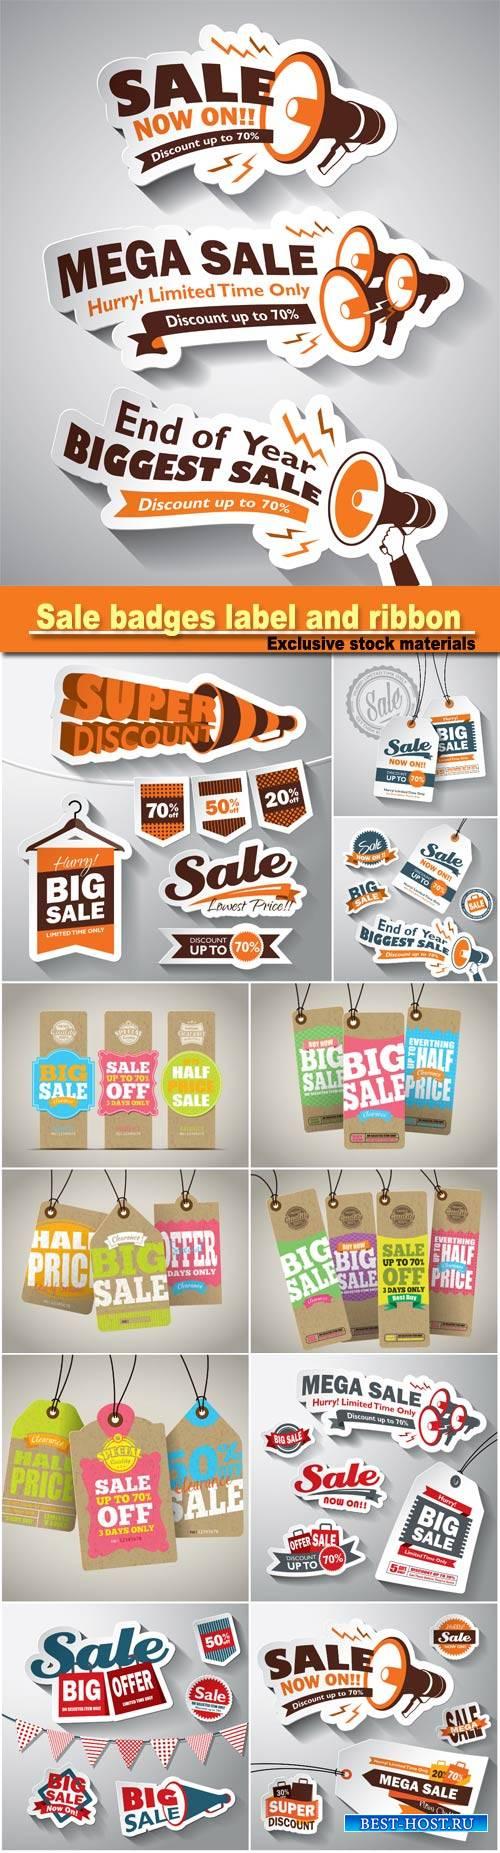 Set sale badges label and ribbon, vector tag illustration